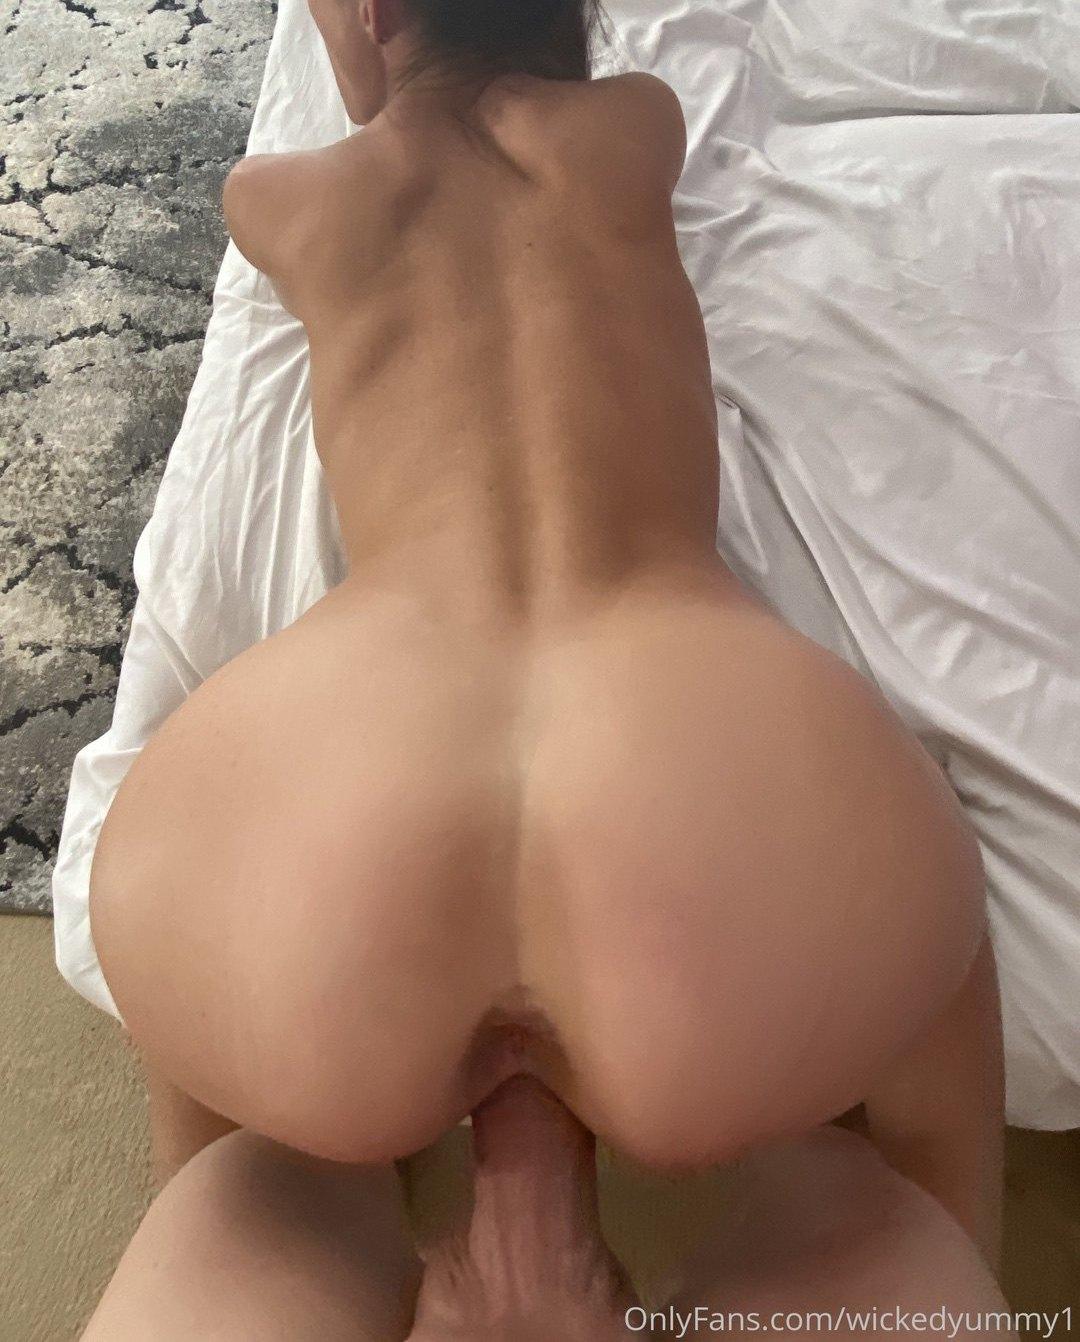 Sofie Marie Wickedyummy1 Onlyfans Nudes Leaks 0017